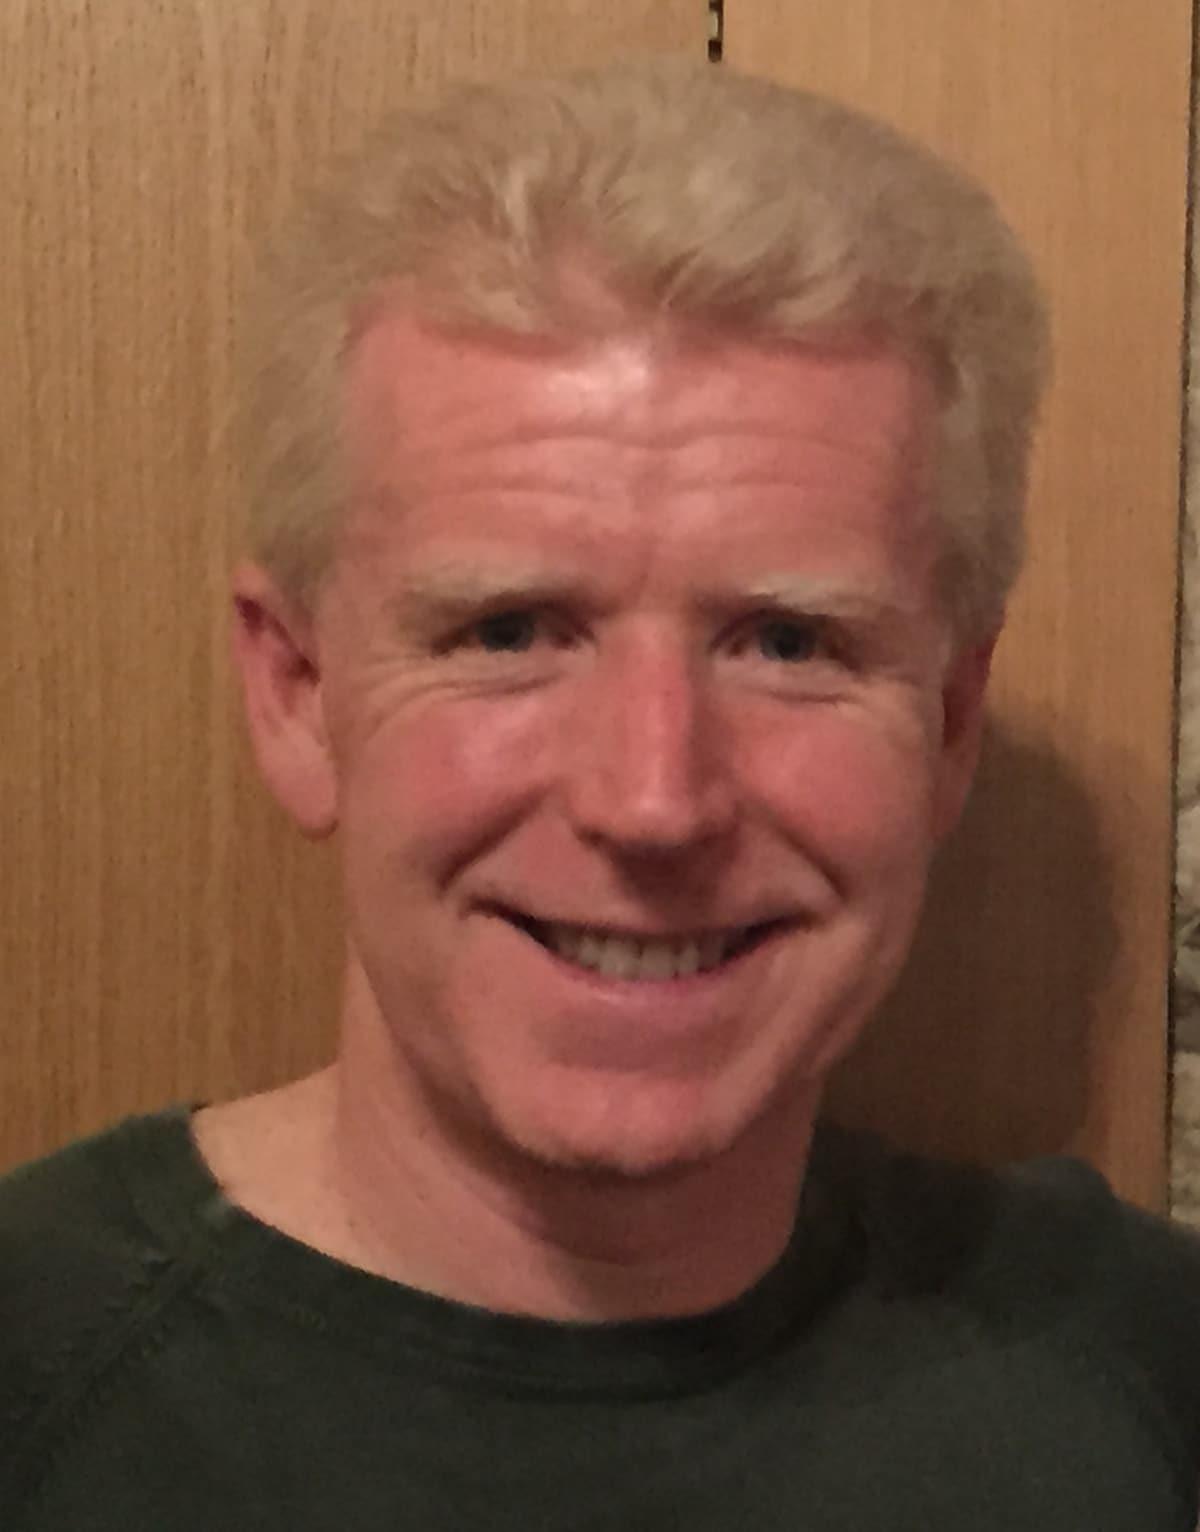 Ciaran From Guildford, United Kingdom